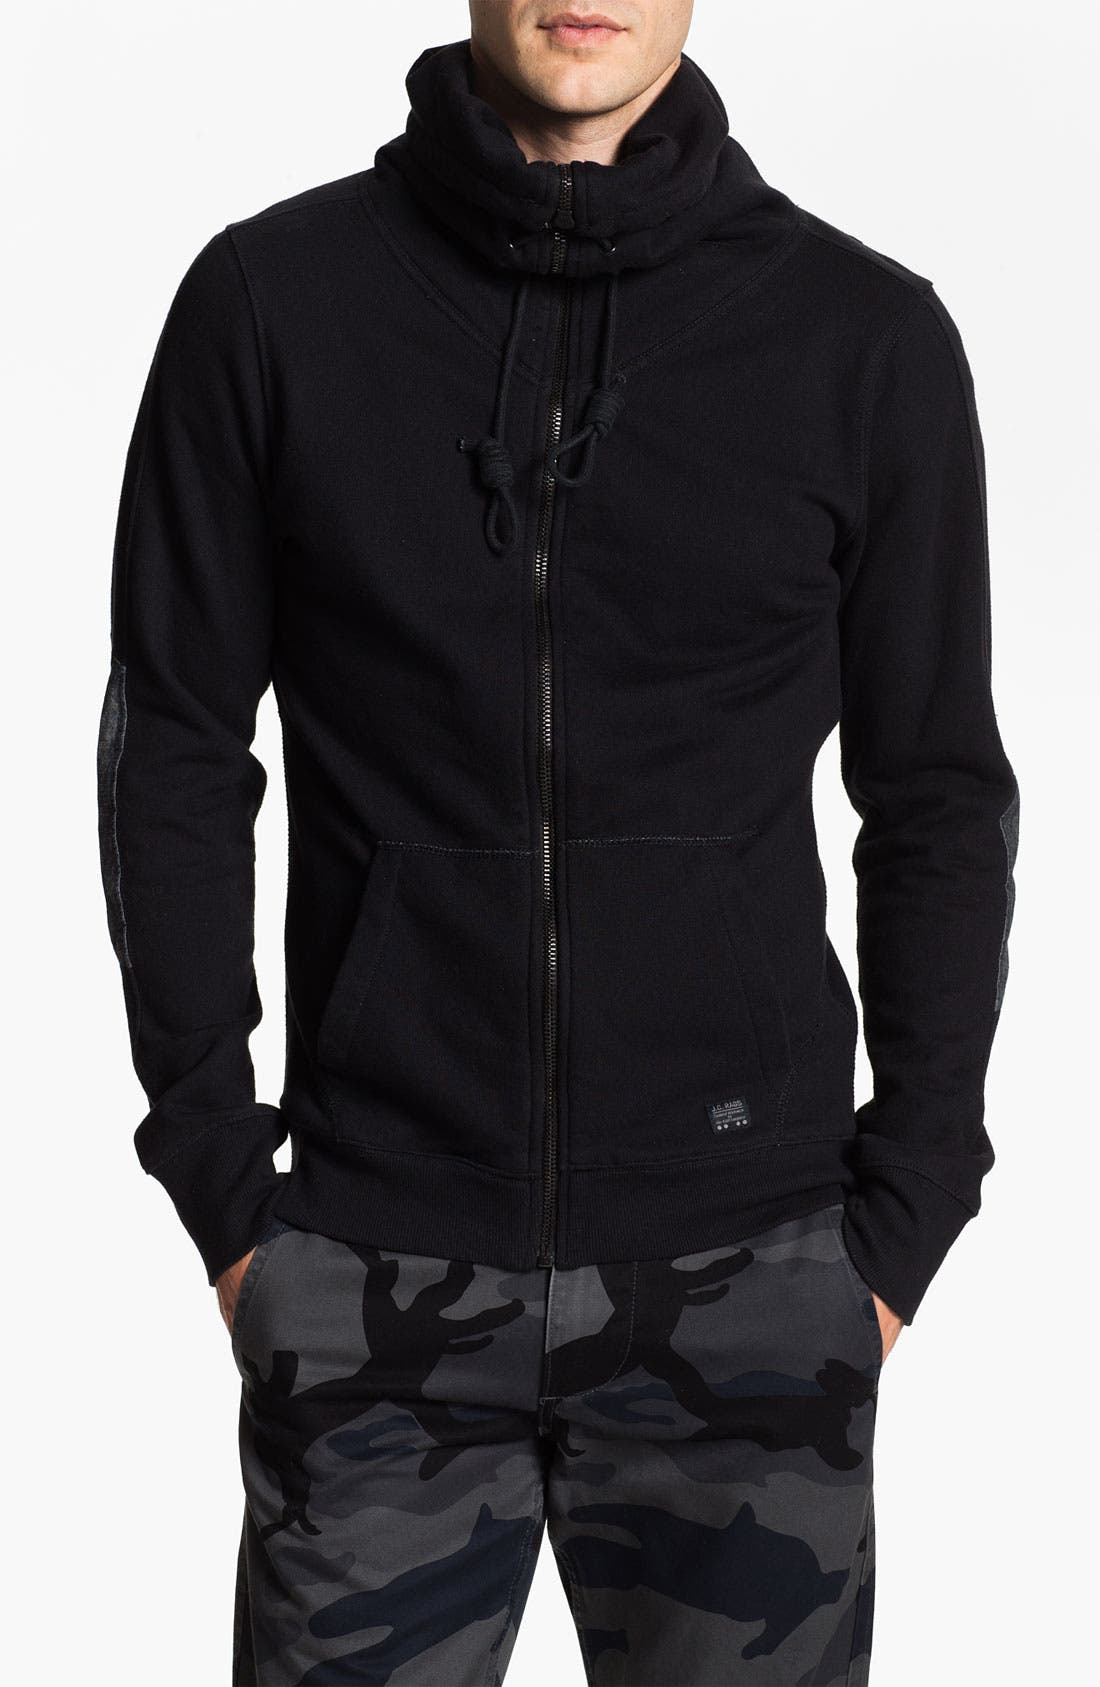 Alternate Image 1 Selected - J.C. Rags Extra Trim Fit Jacket